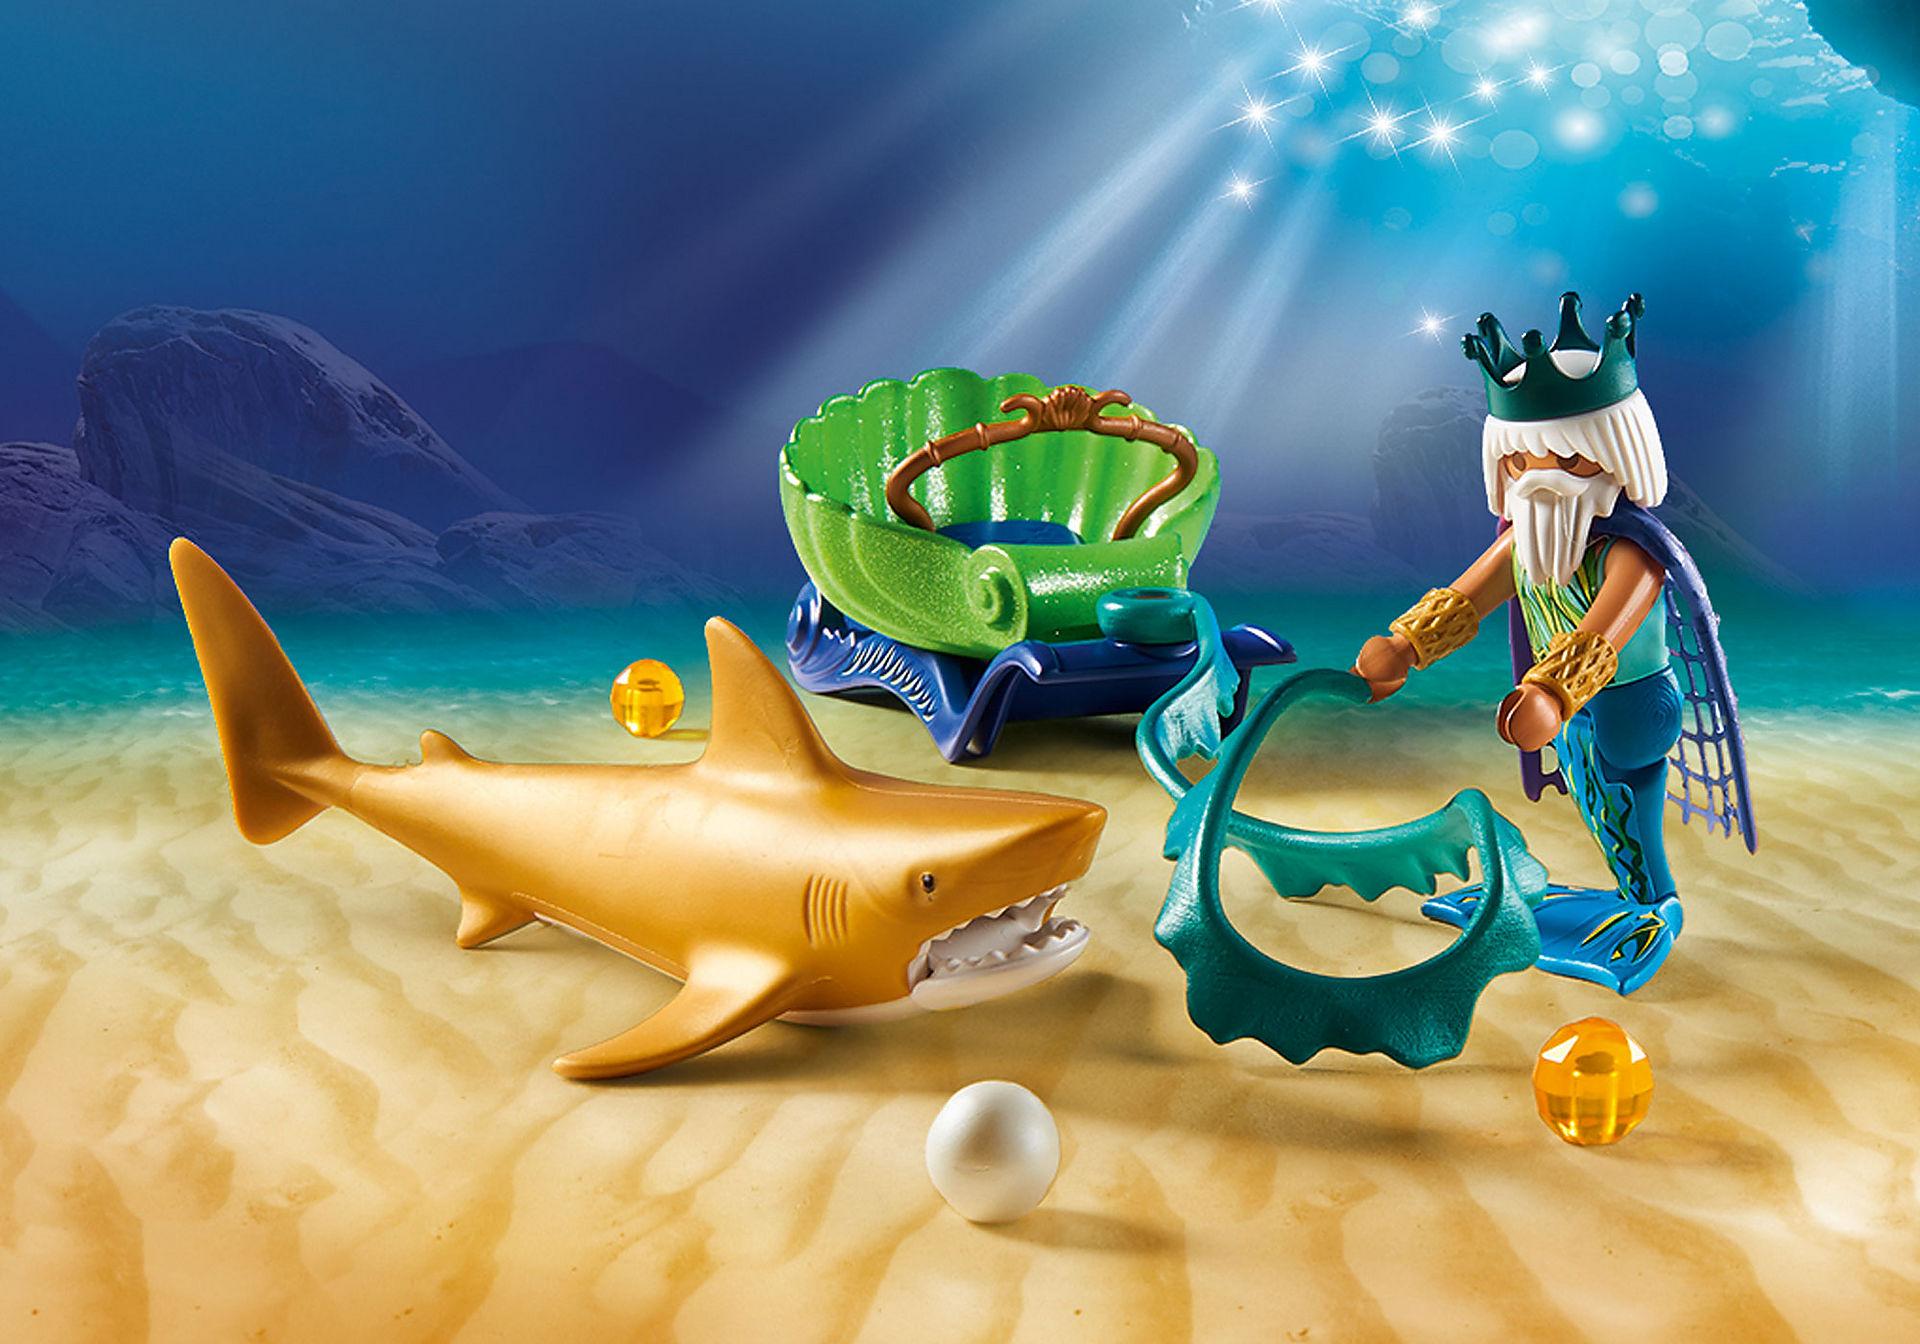 70097 Meereskönig mit Haikutsche zoom image4